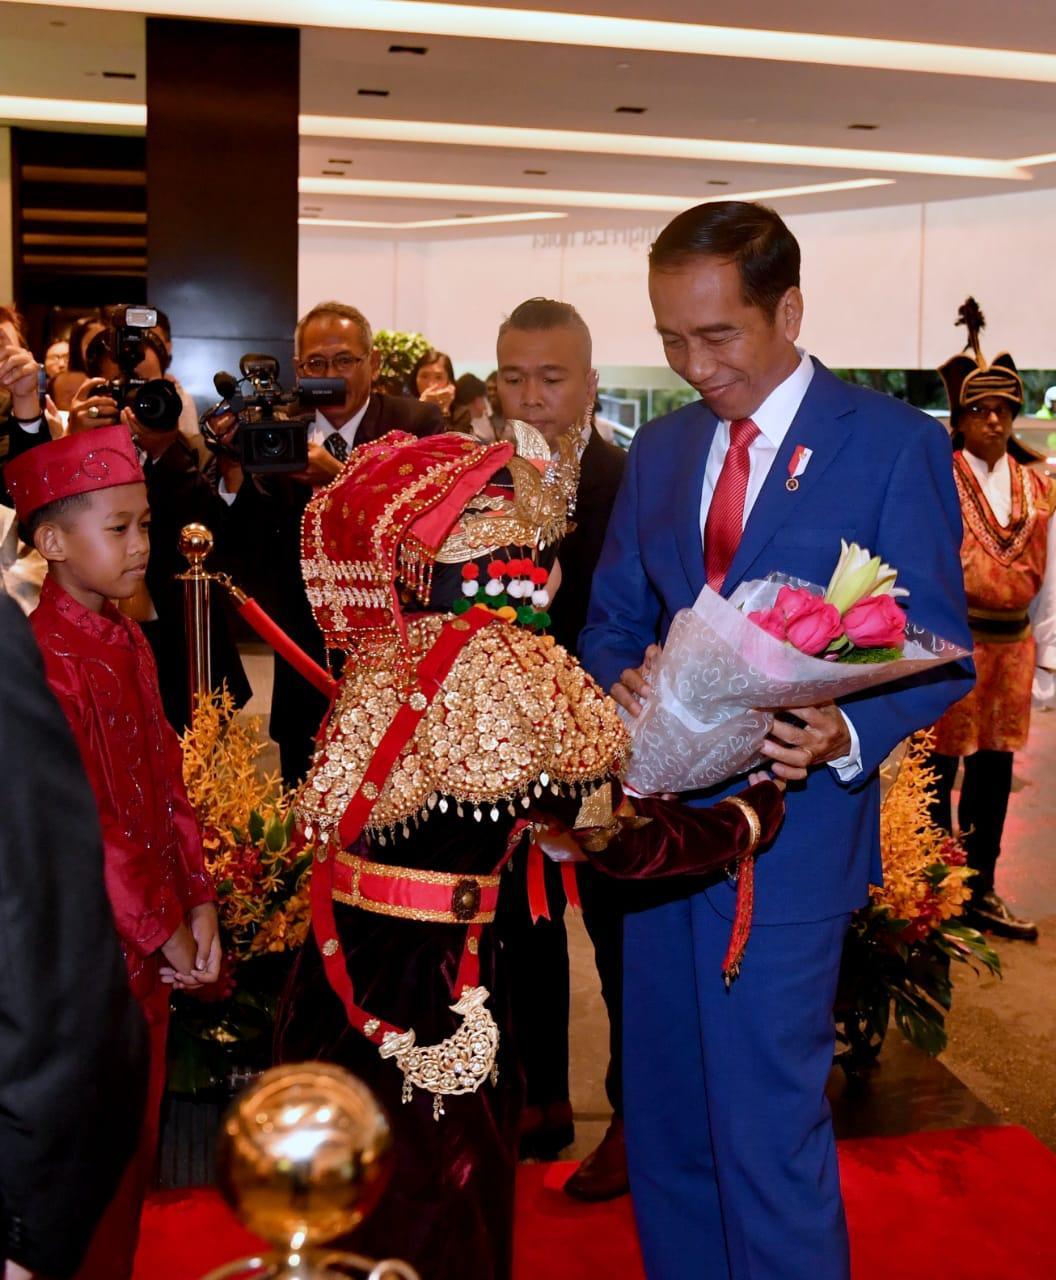 Bertolak ke Singapura, Presiden Hadiri KTT Asean